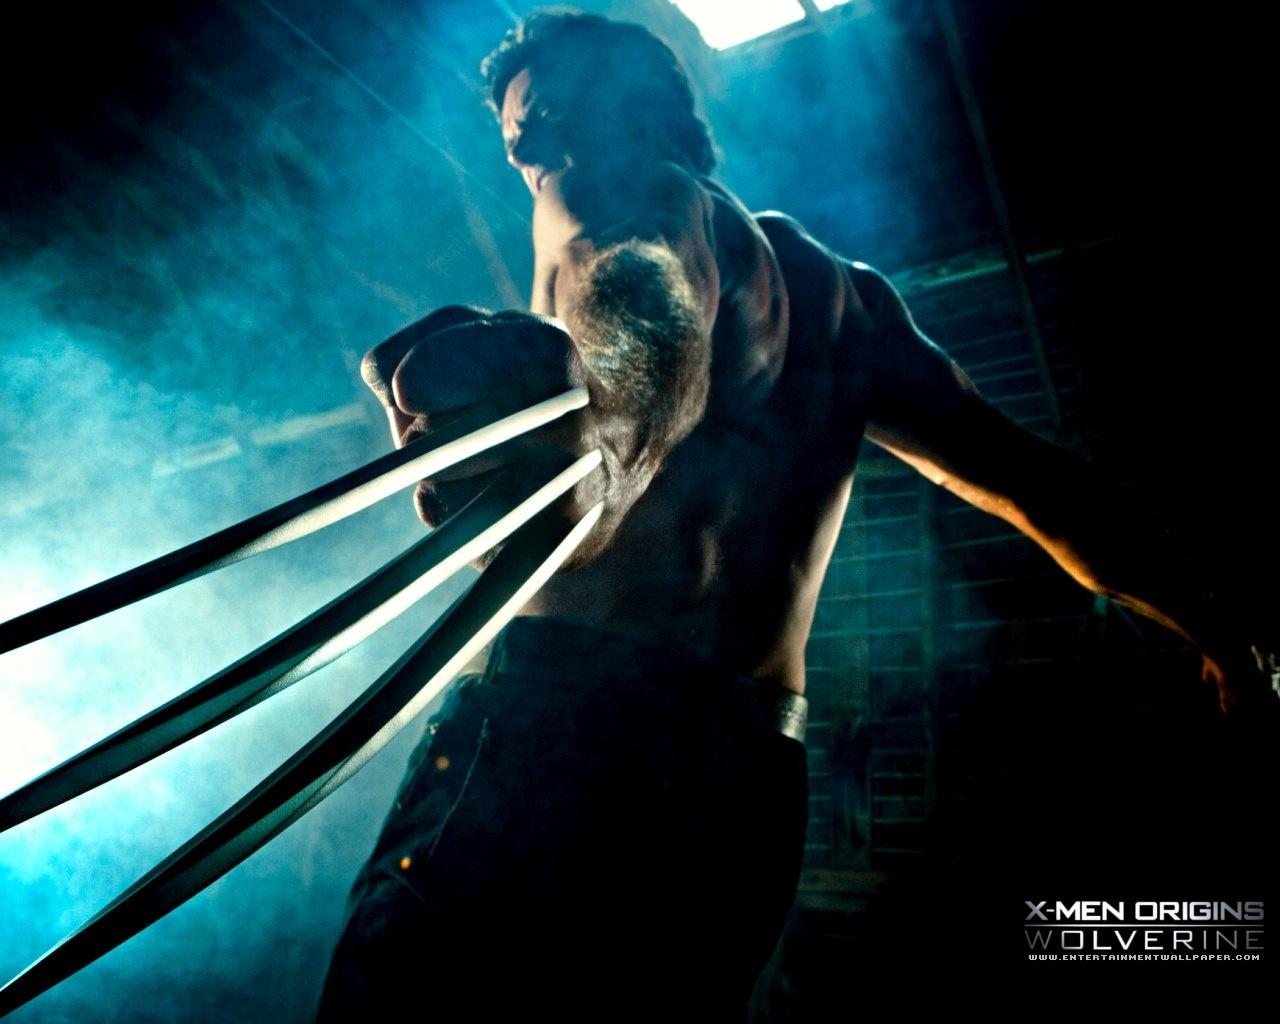 X-Men Origins: Wolverine Wallpaper - Upcoming Movies ...  X Men 2 Movie Wallpaper